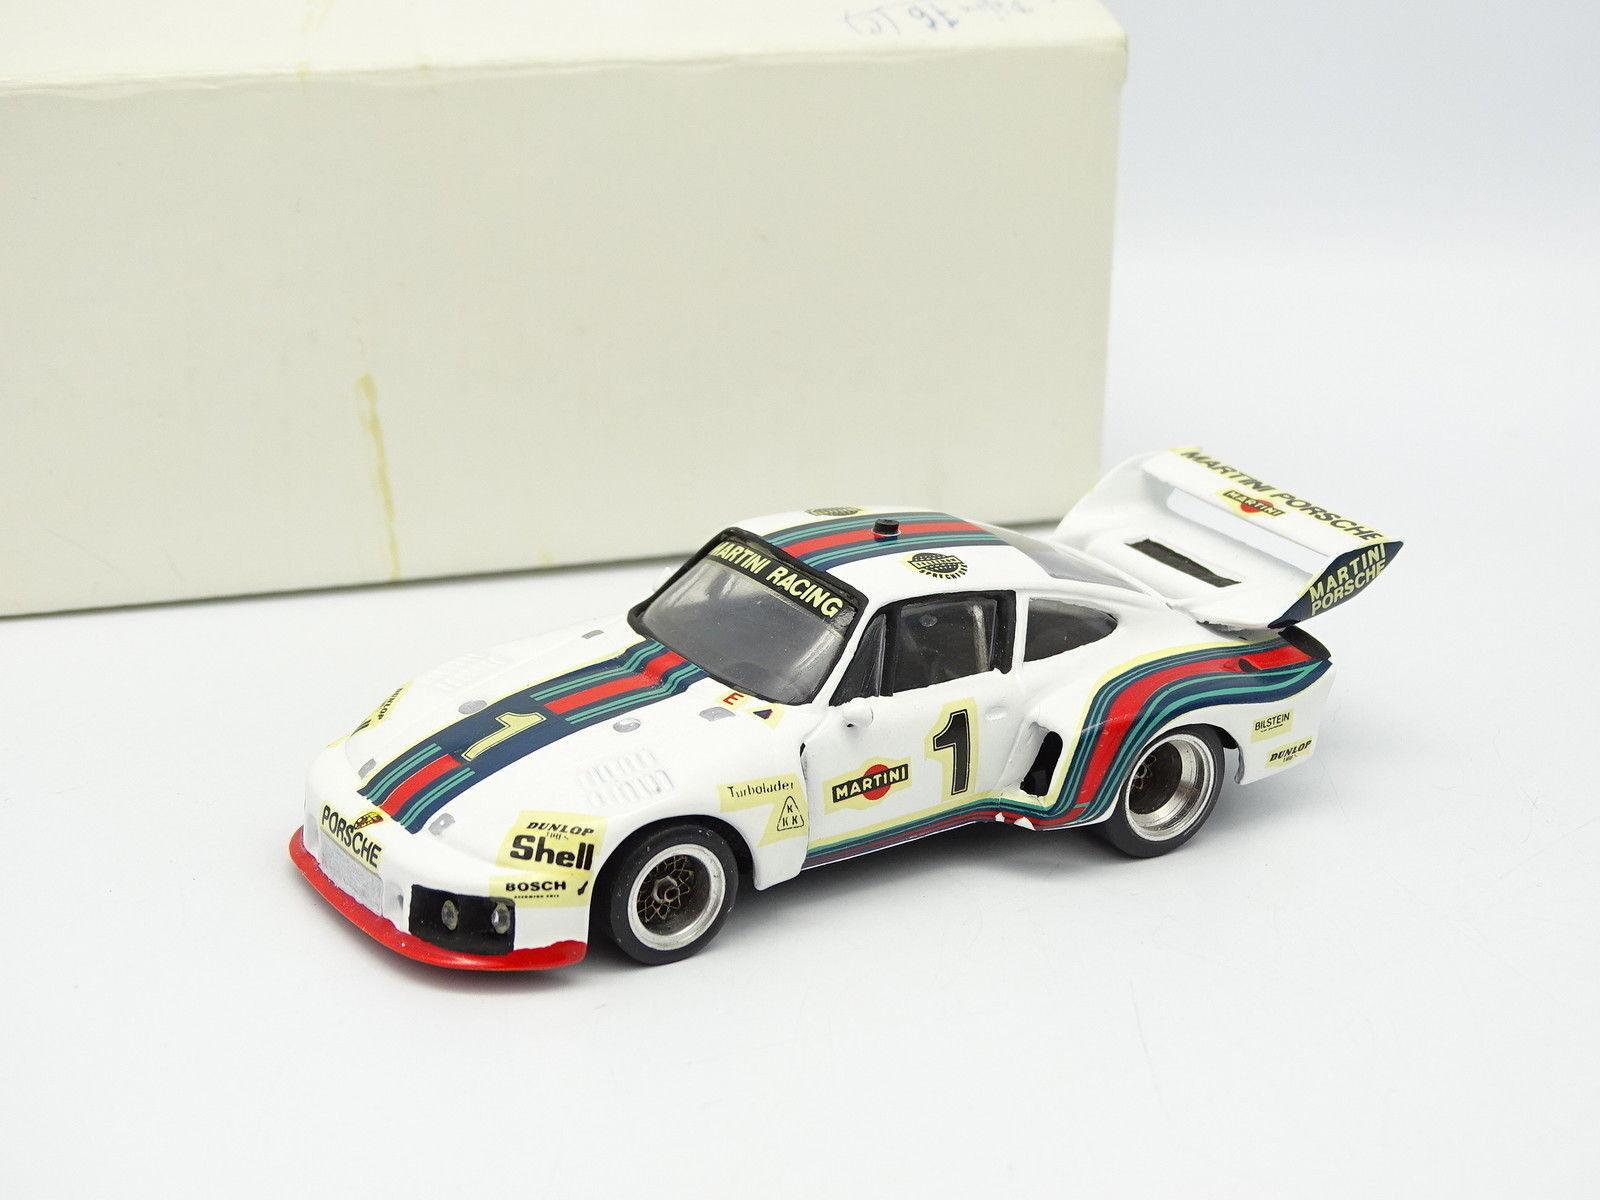 MRE Kit Mounted Metal 1 43 - Porsche 935 6 hours Dijon 1976 Martini No. 1